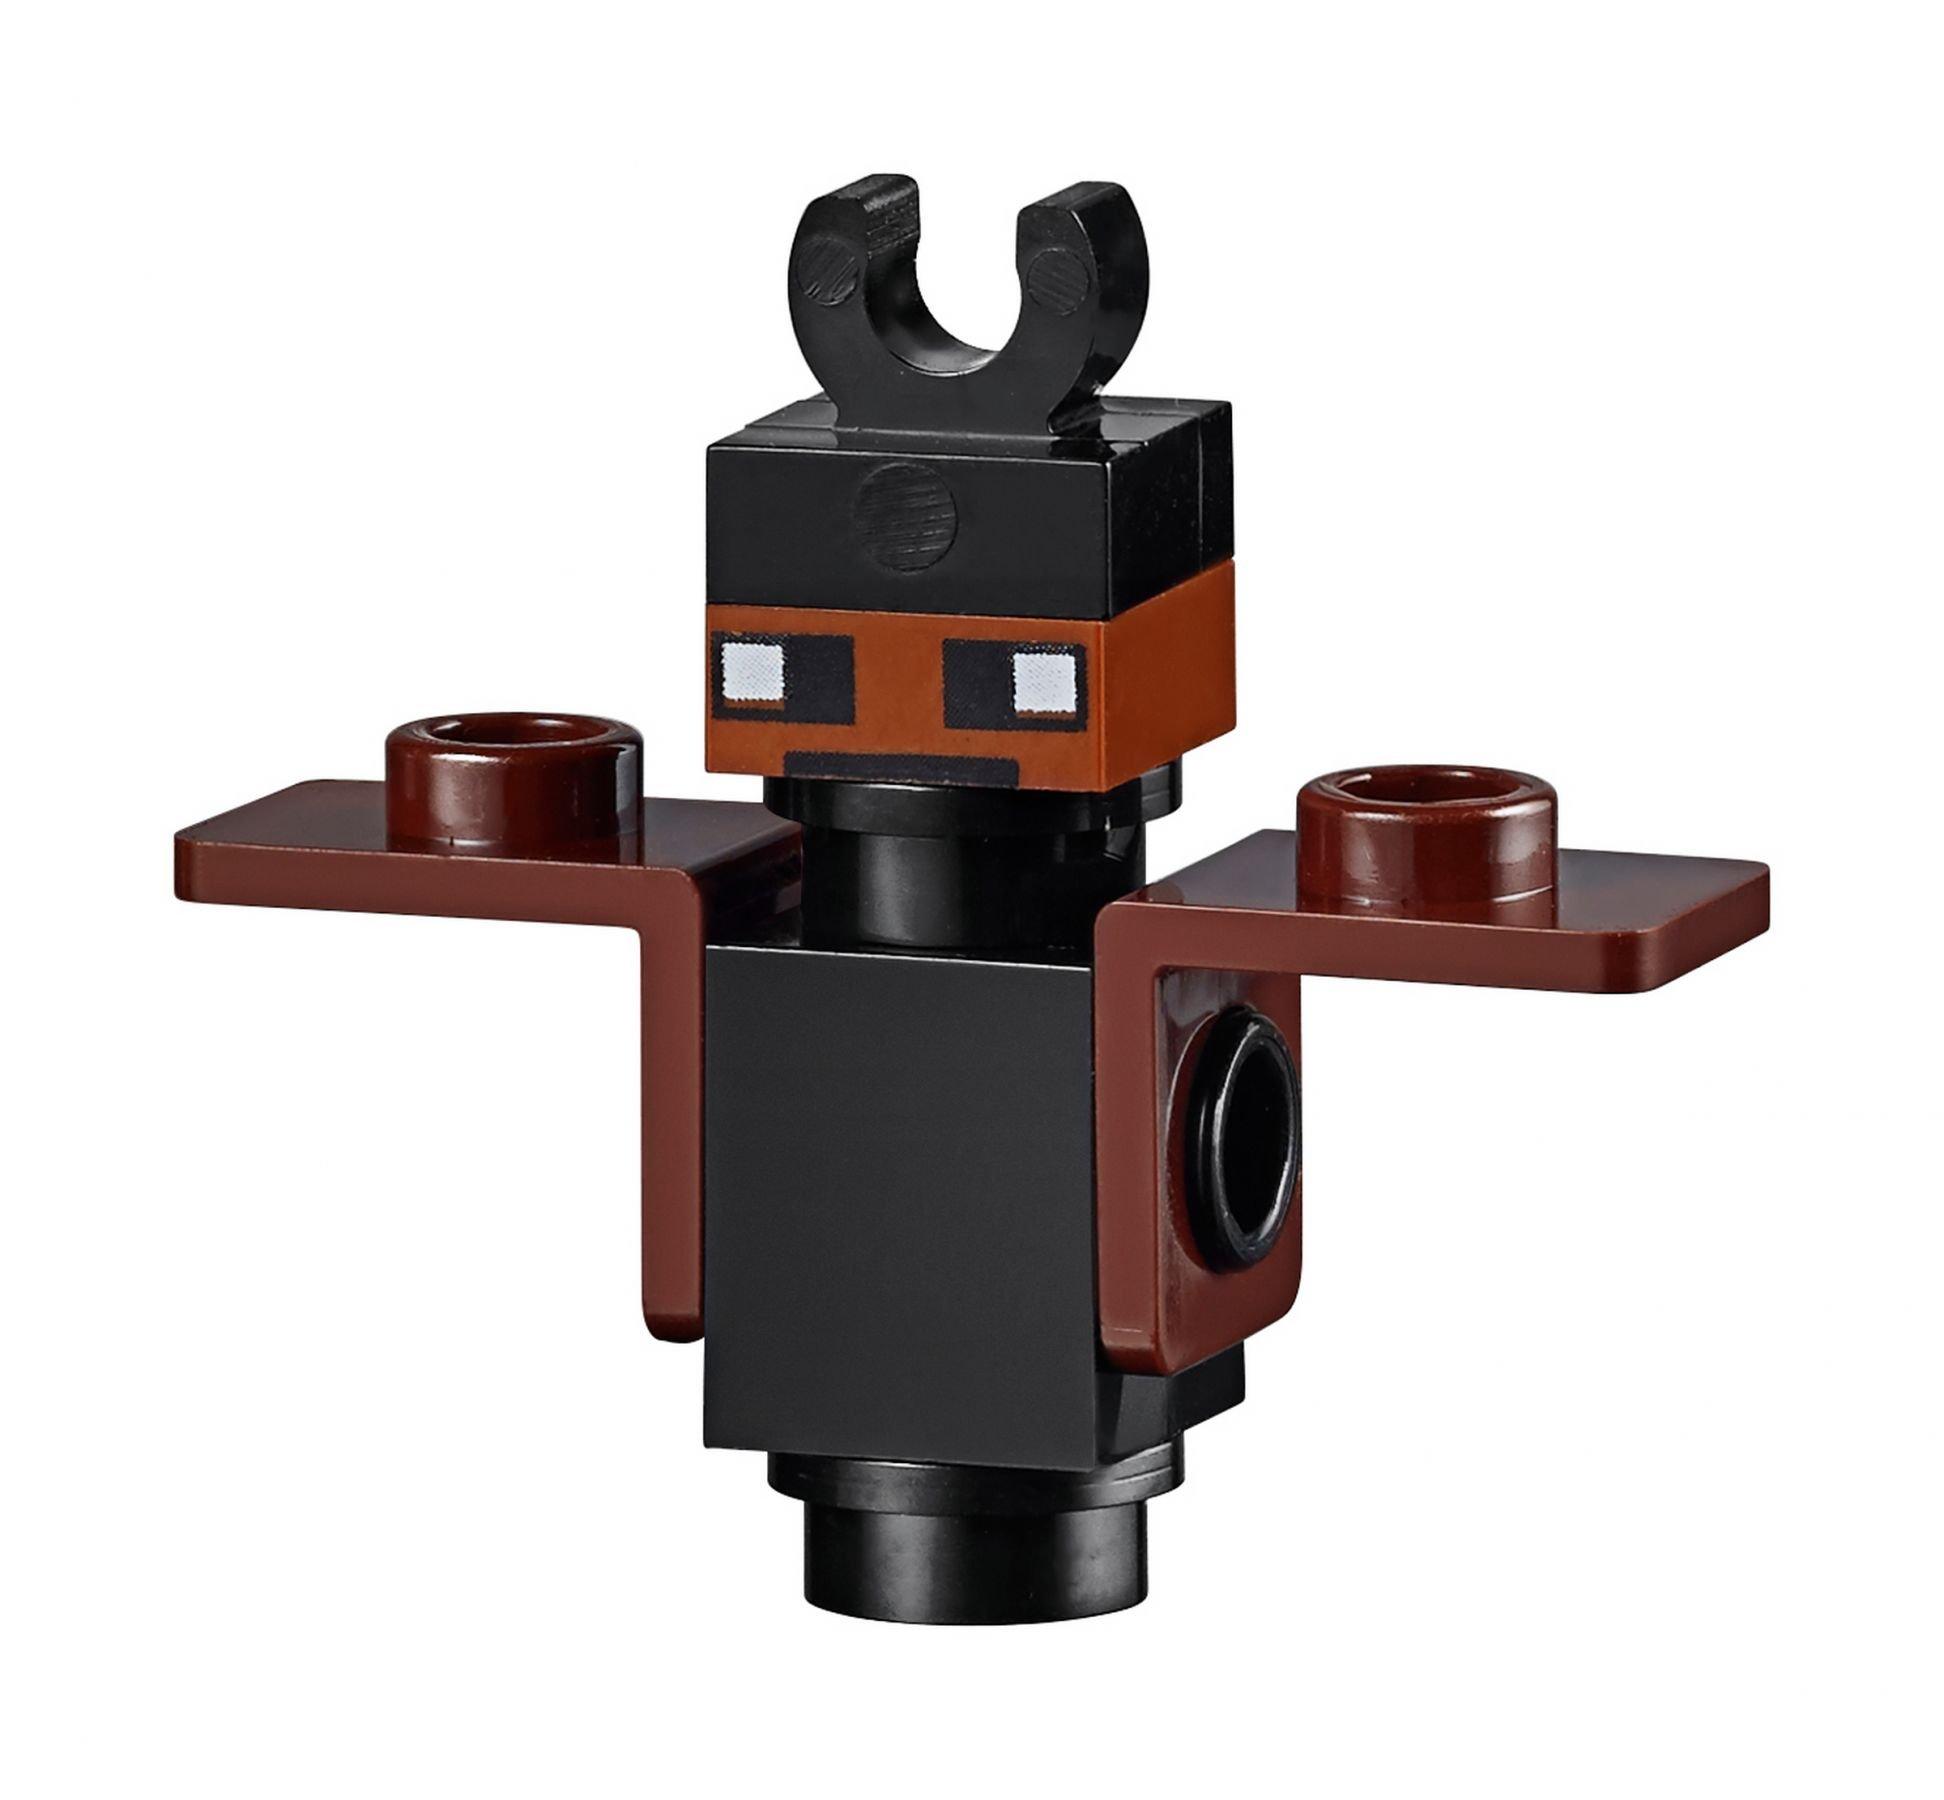 die bergh hle 21137 lego minecraft 2017 im preisvergleich the mountain cave. Black Bedroom Furniture Sets. Home Design Ideas